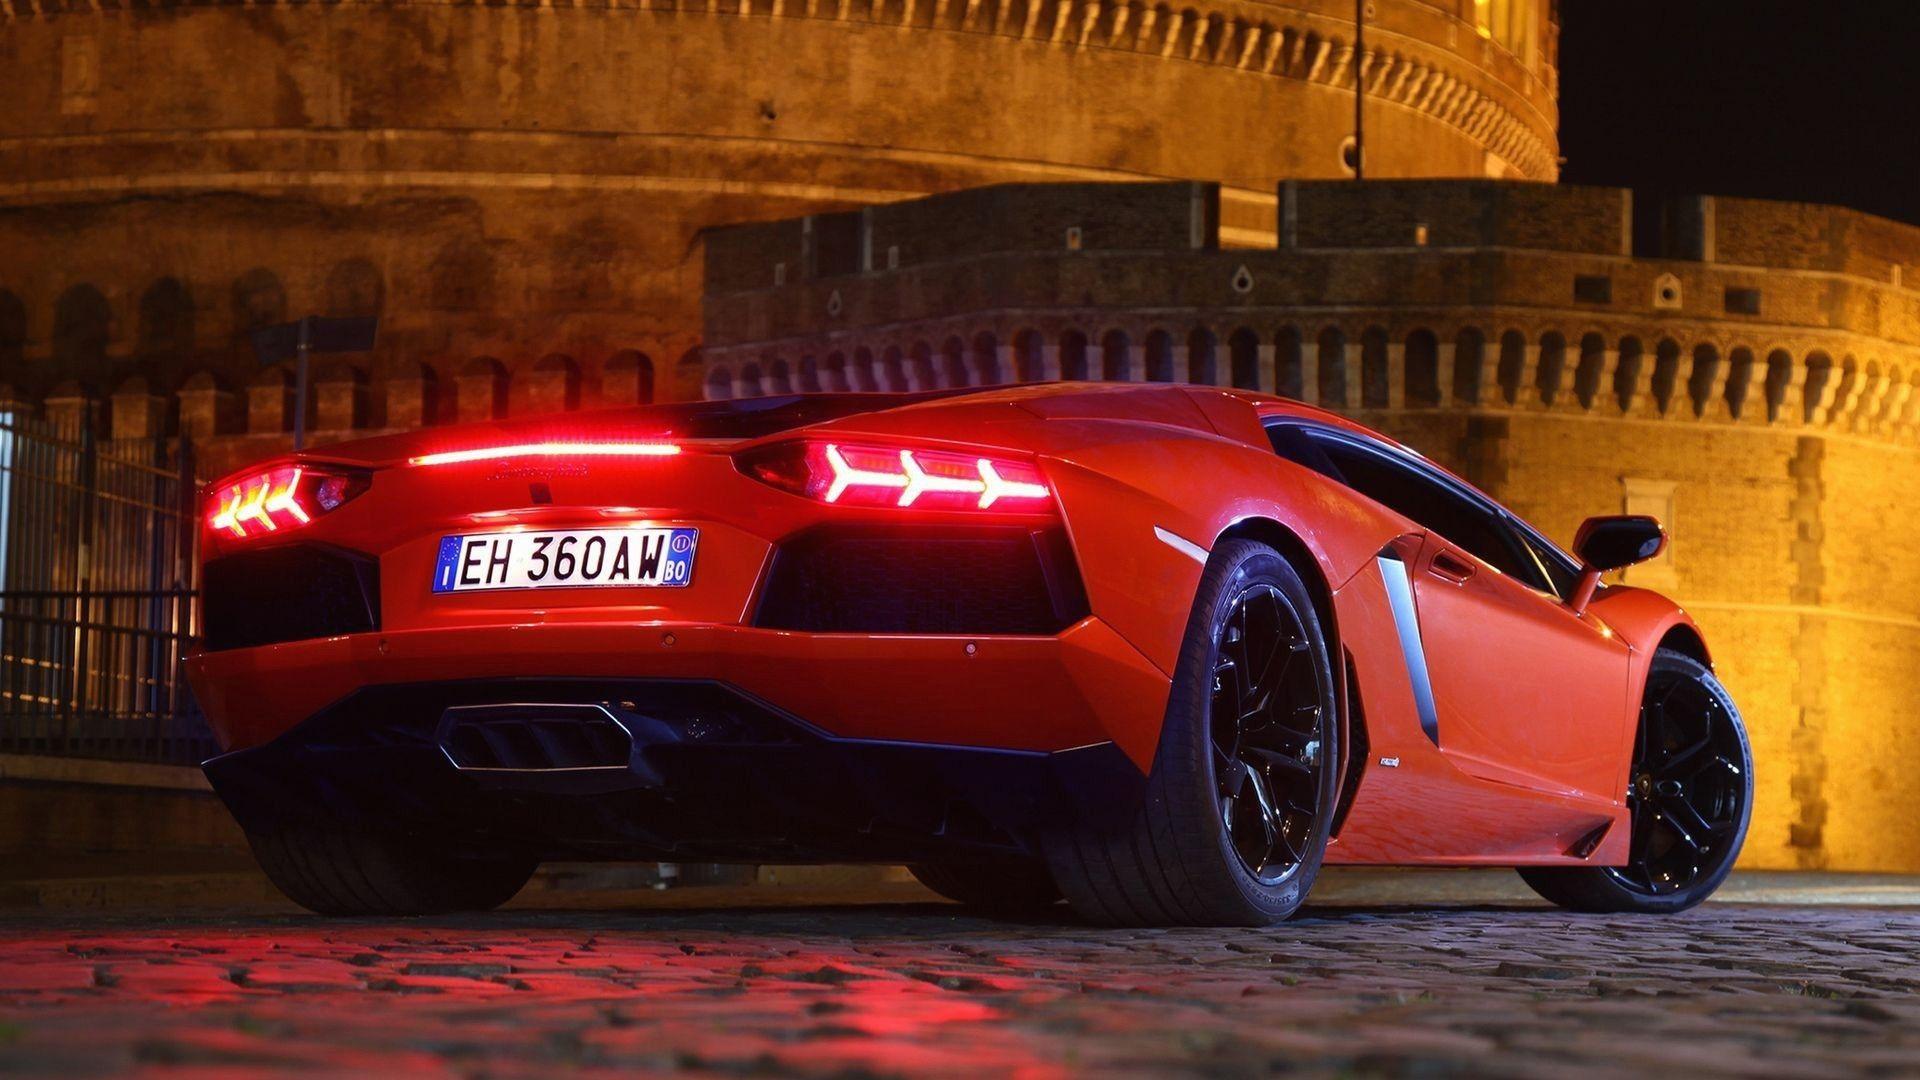 Ferrari Car Hd Wallpapers 1080p 330301 Red Lamborghini Lamborghini Aventador Wallpaper Lamborghini Cars